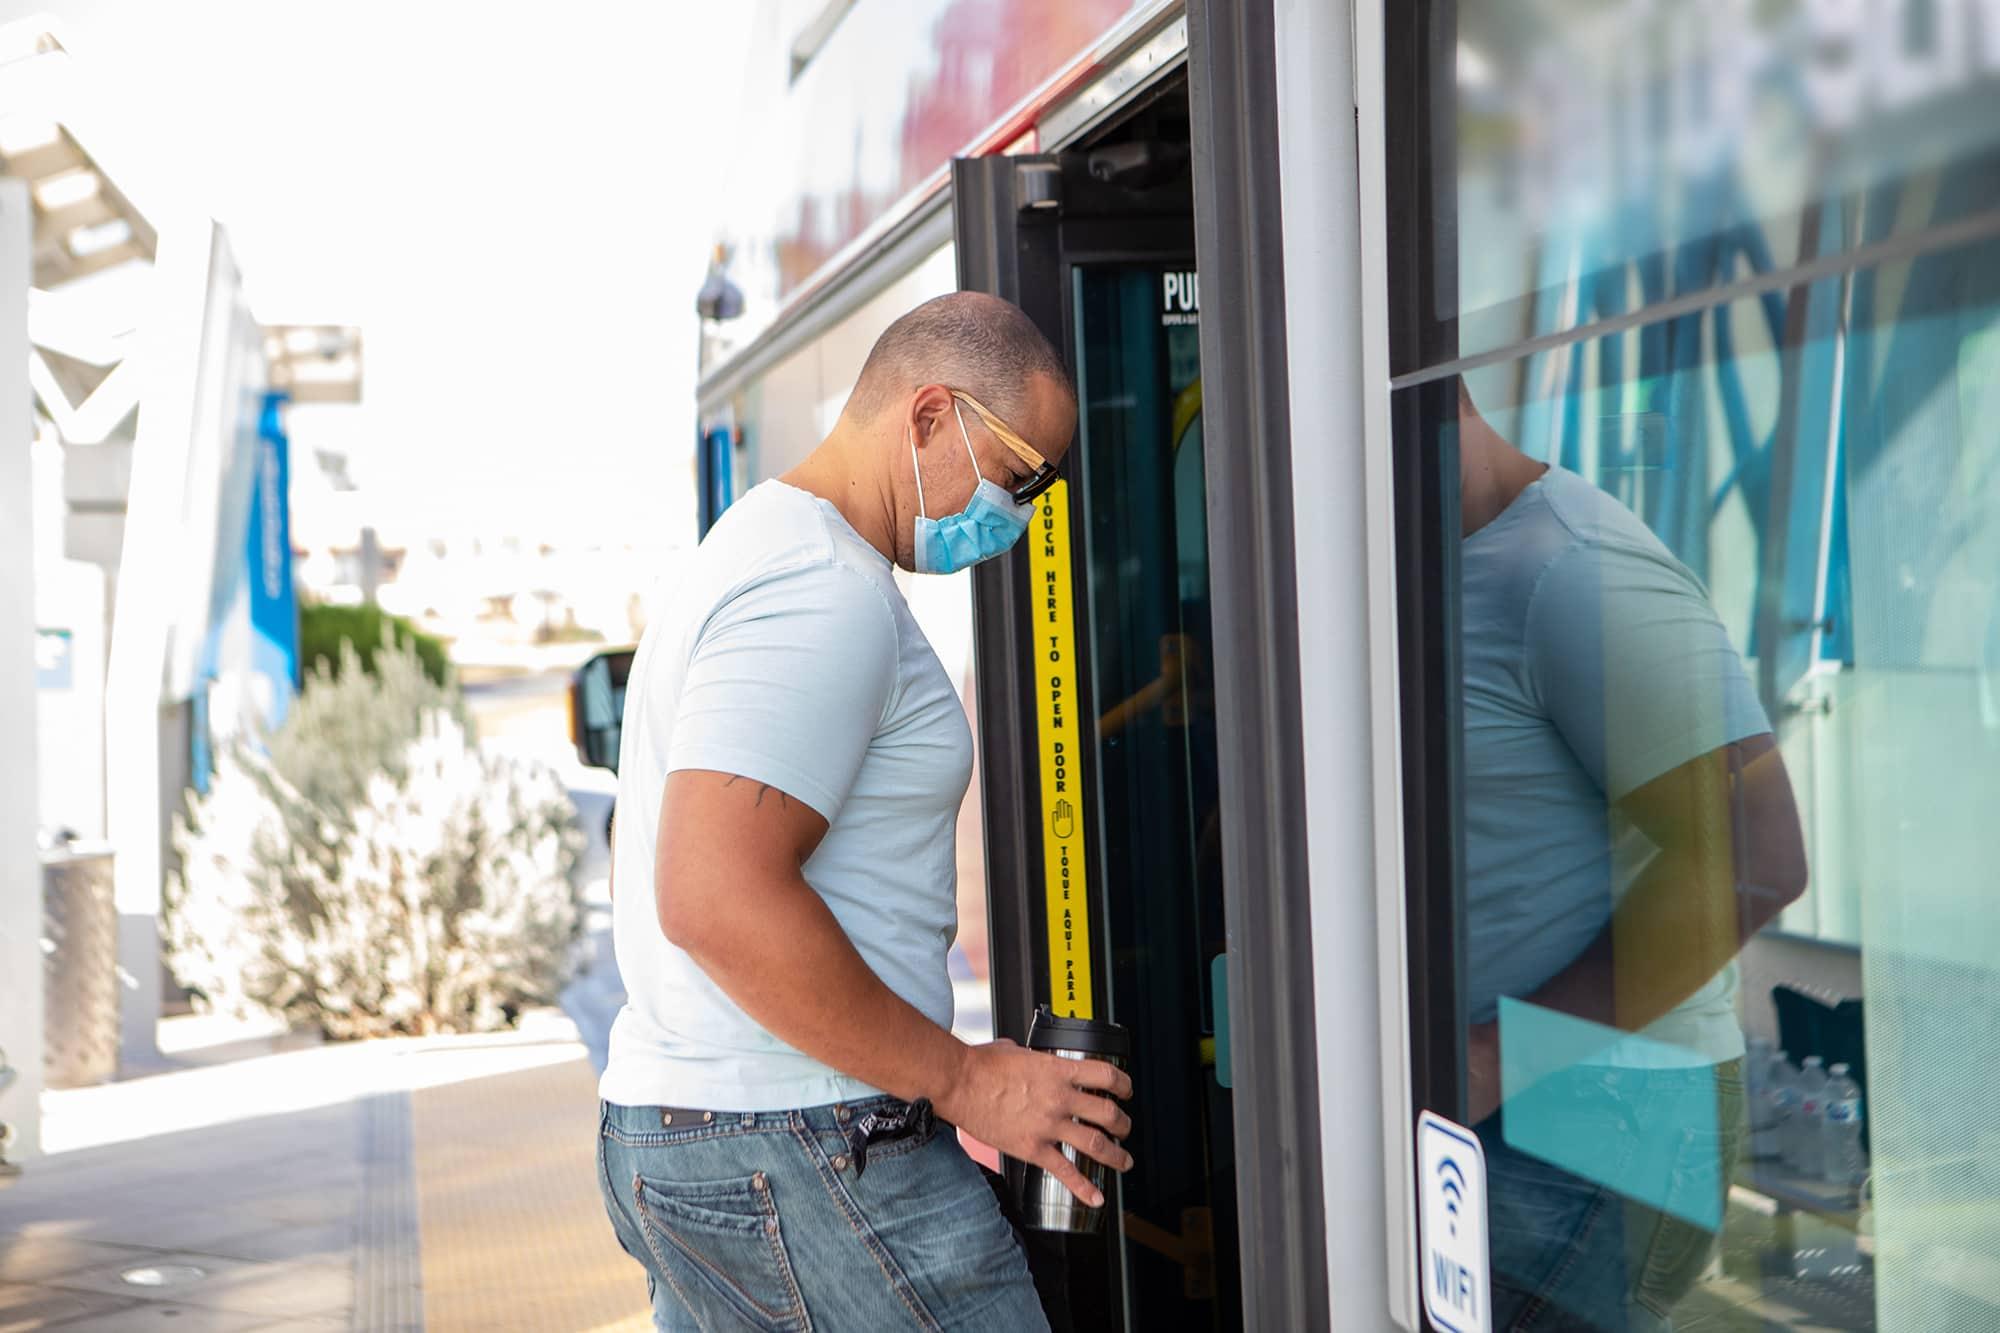 Omnitrans Seeks Input on Service Resumption & Future Transit Plan